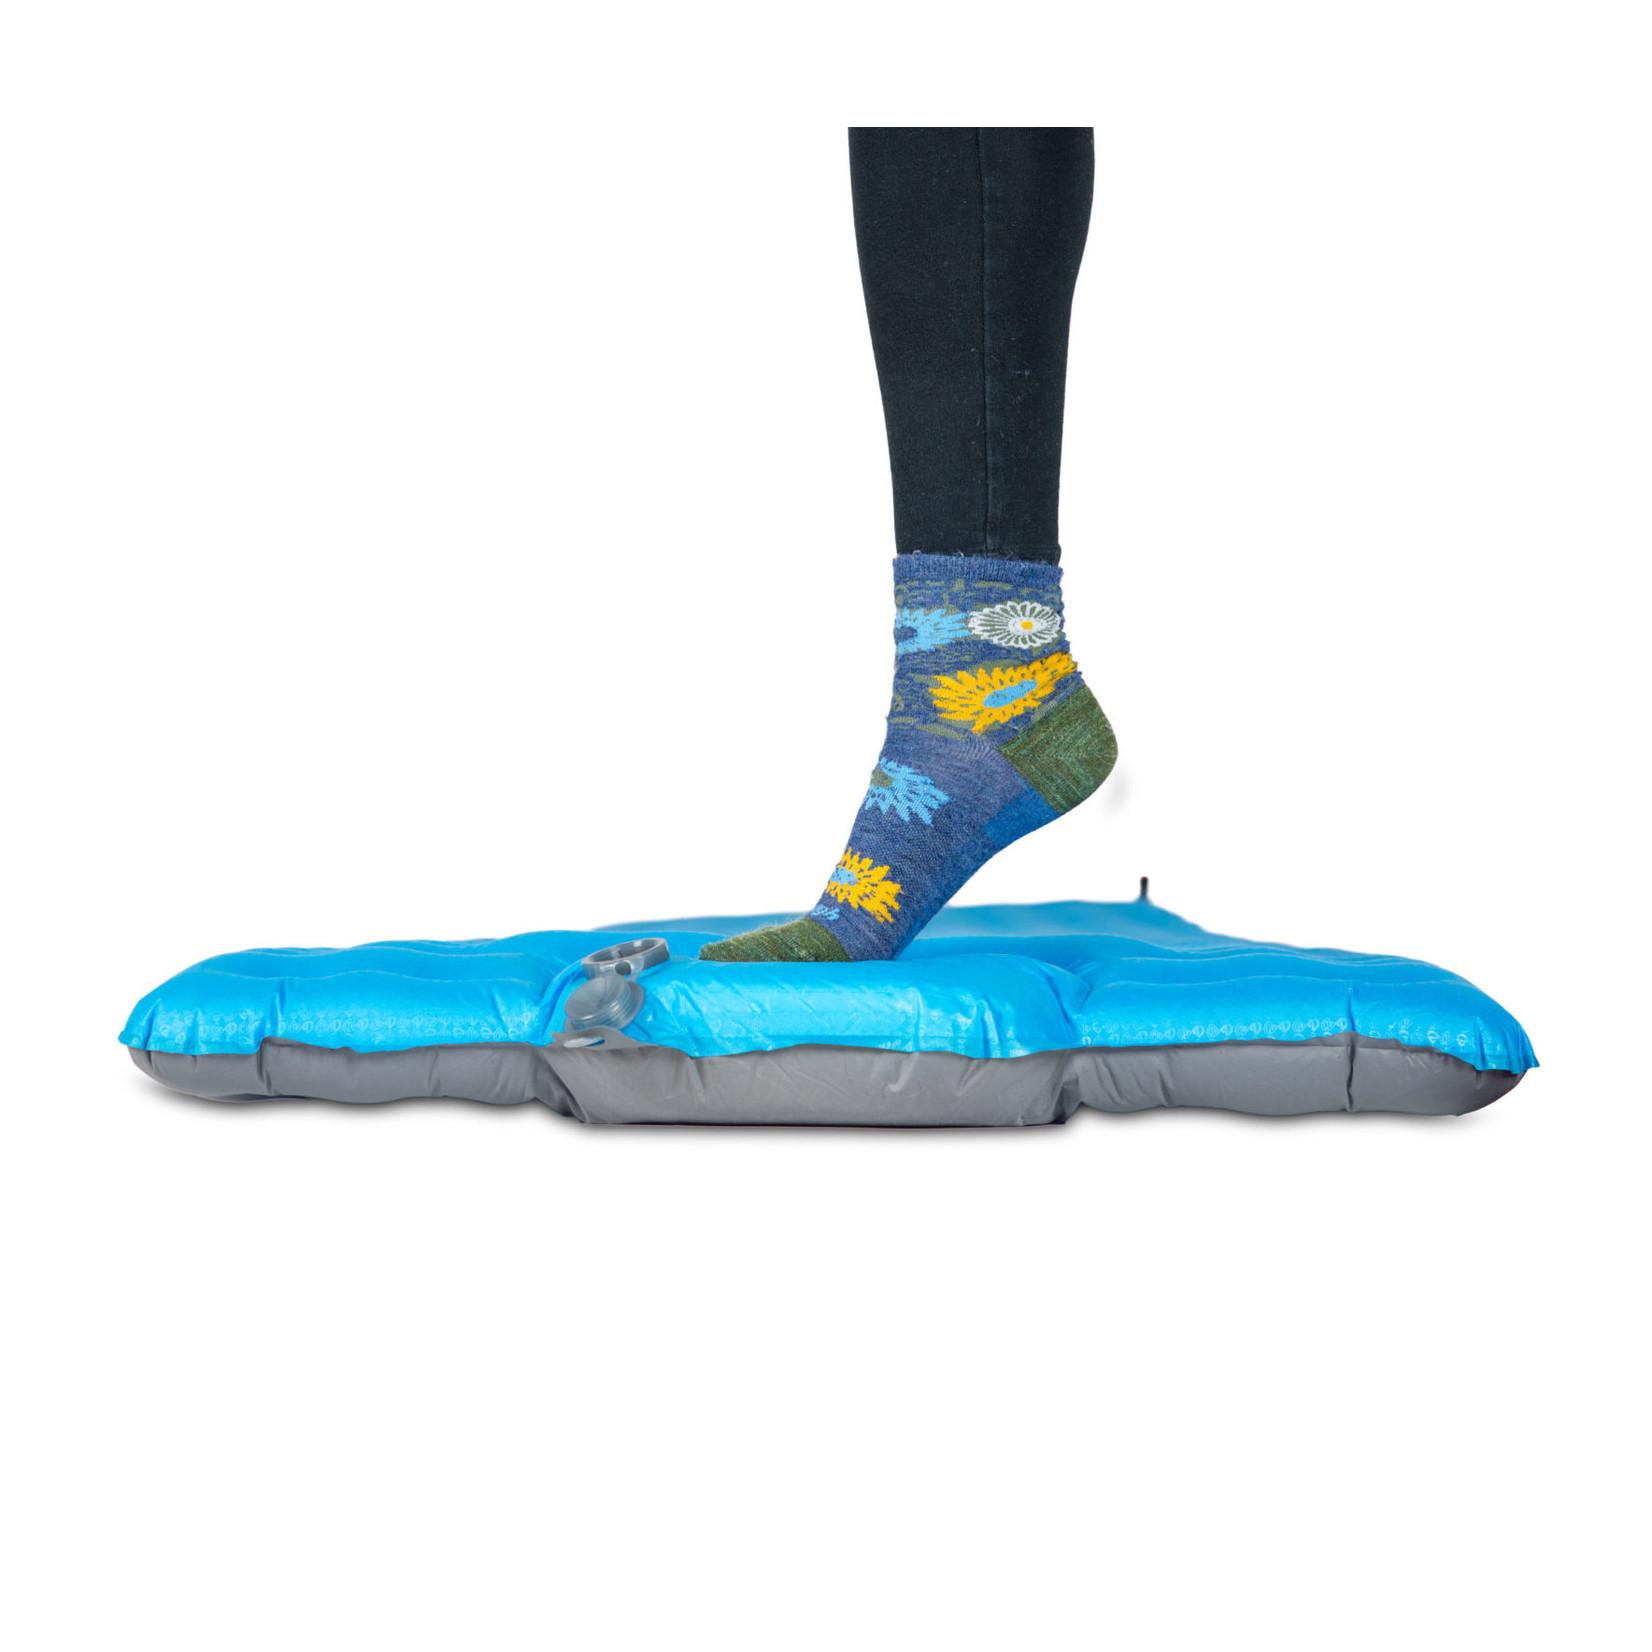 NEMO Vector™ Ultralight Sleeping Pad + Foot Pump